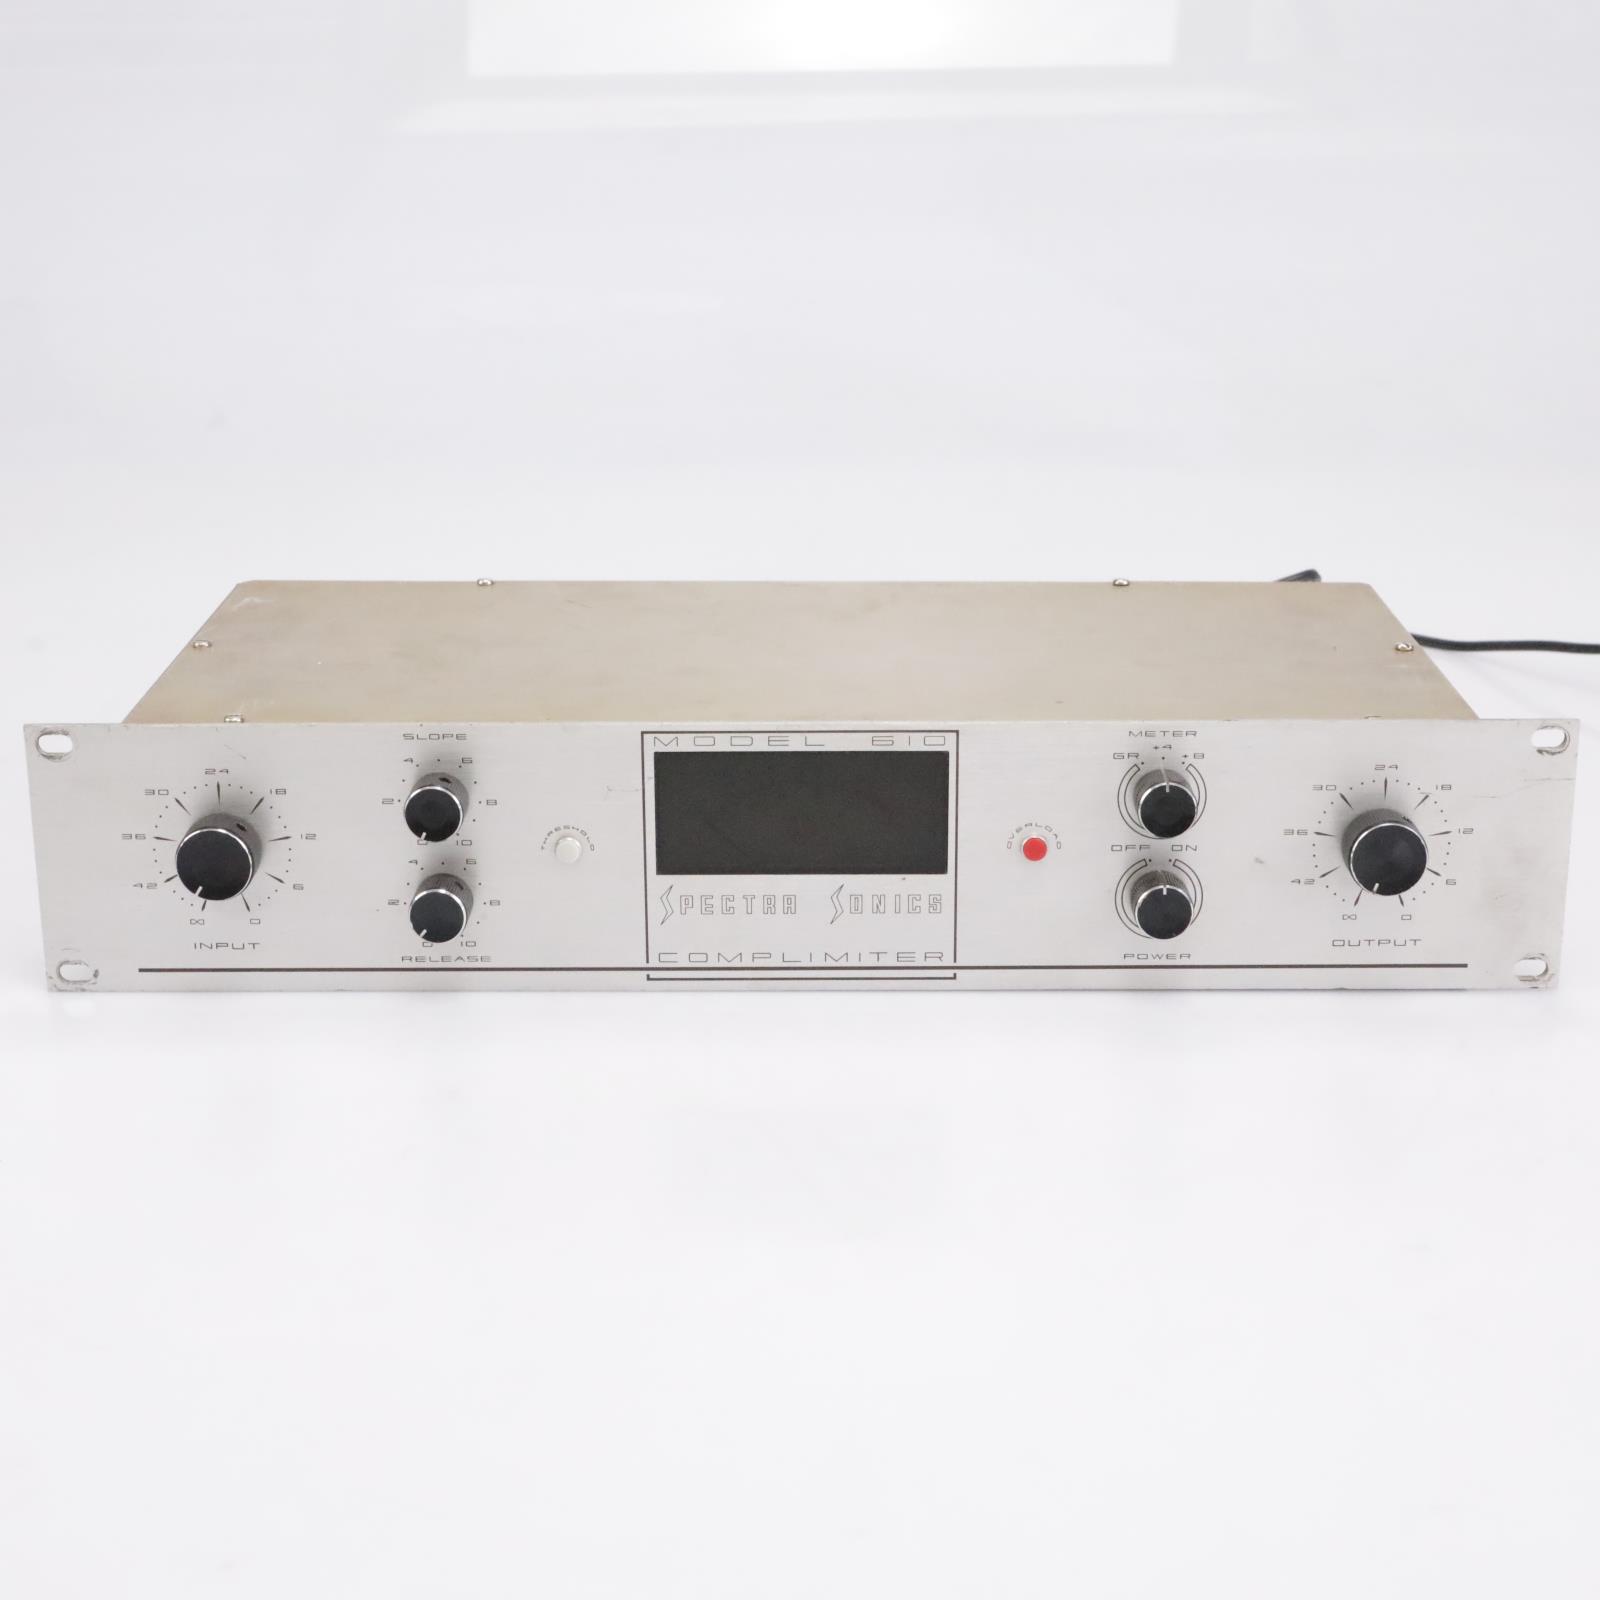 Spectra Sonics Model 610 Complimiter (Compressor / Limiter) #43553